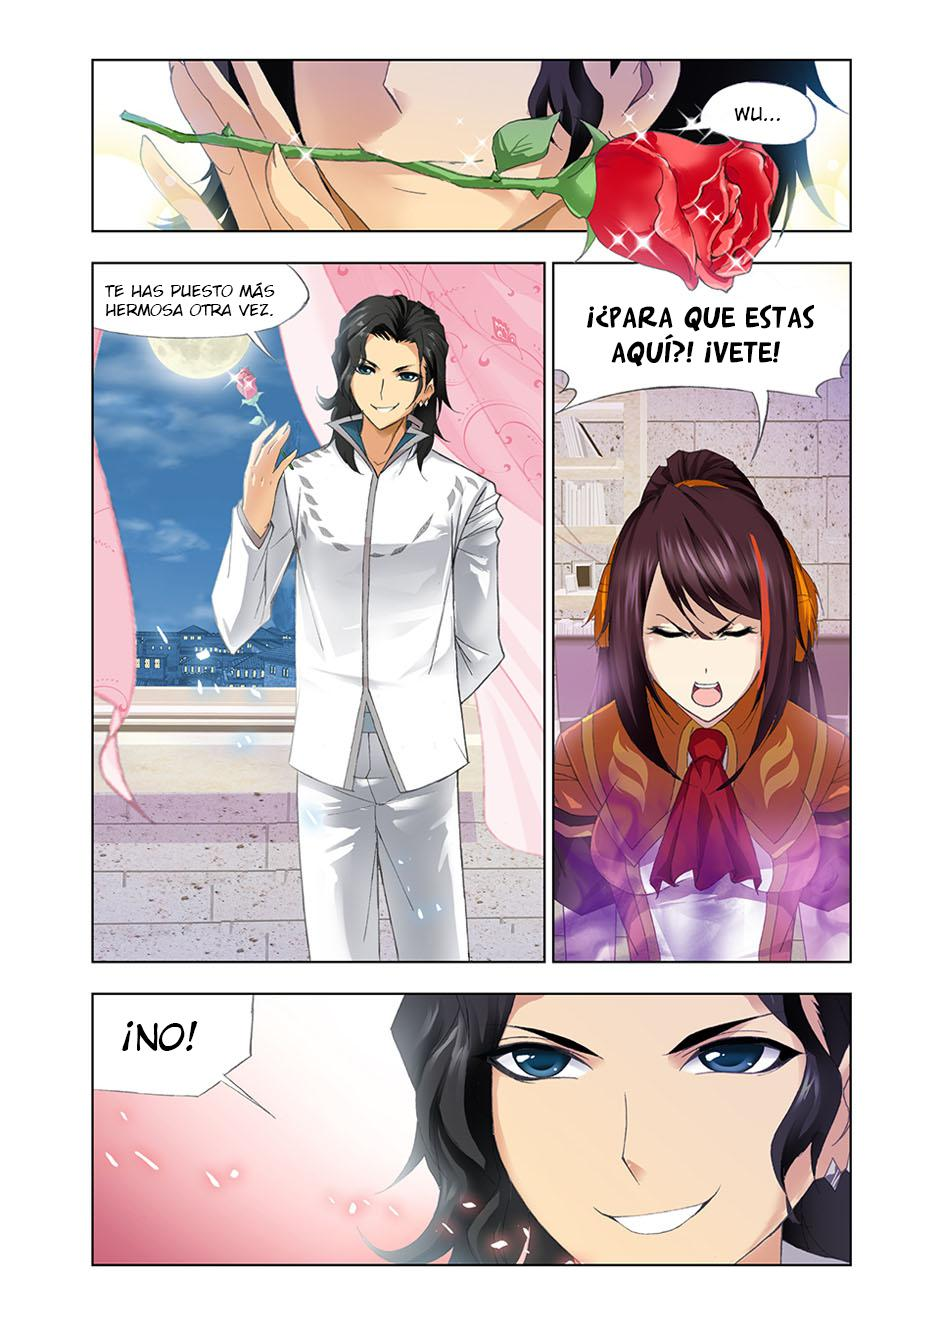 http://c5.ninemanga.com/es_manga/18/16210/417363/aca5d0940096c29f103a994dec2773ec.jpg Page 9